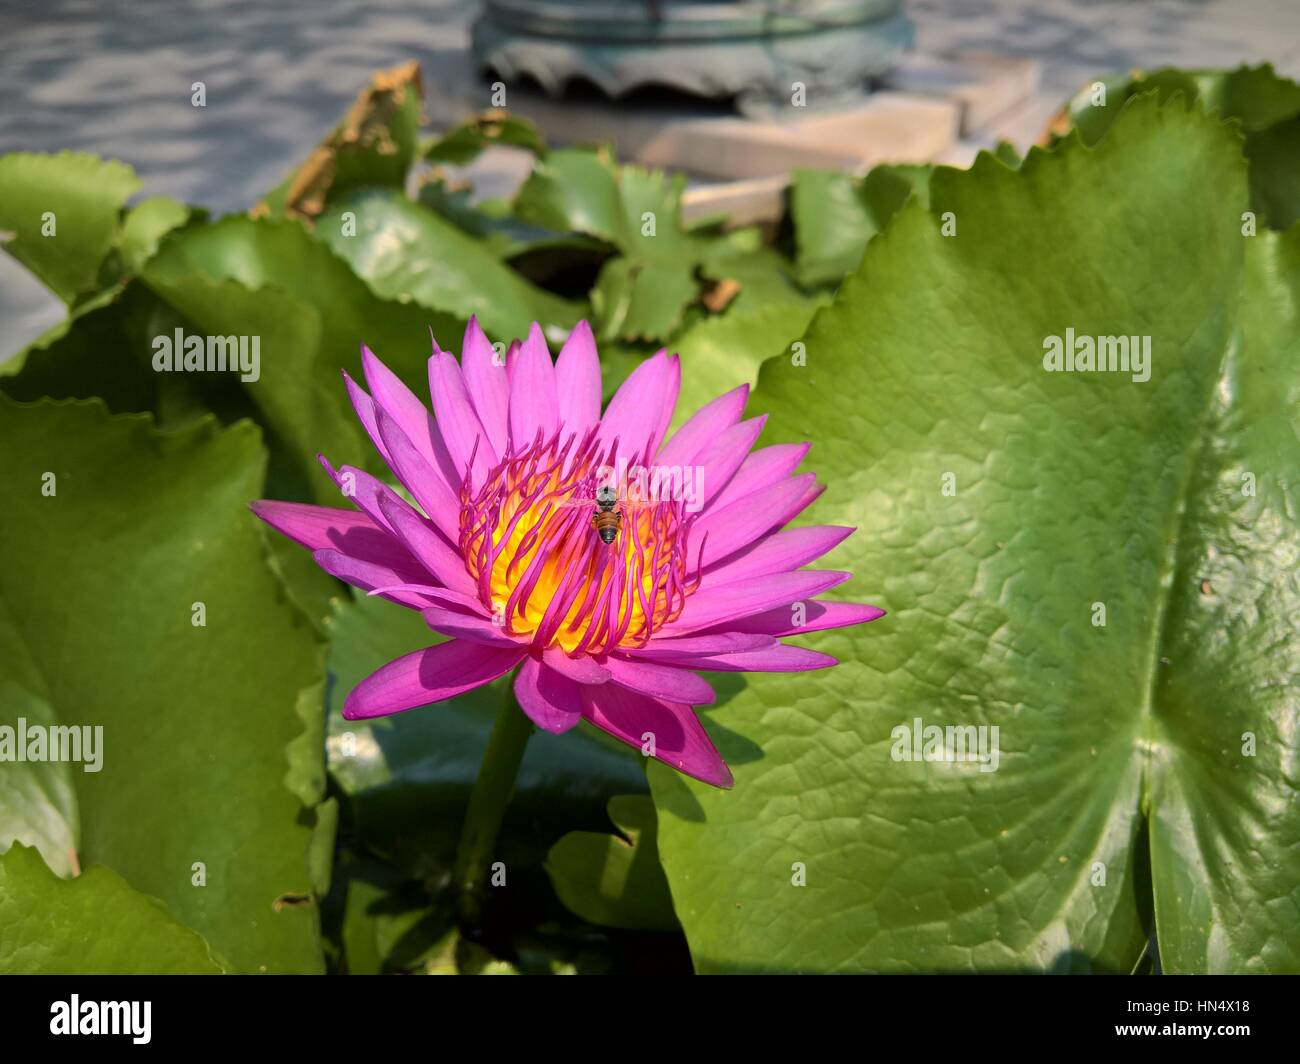 Bug eating flower petal stock photos bug eating flower petal stock close up flower a beautiful purple waterlily or lotus flower stock image mightylinksfo